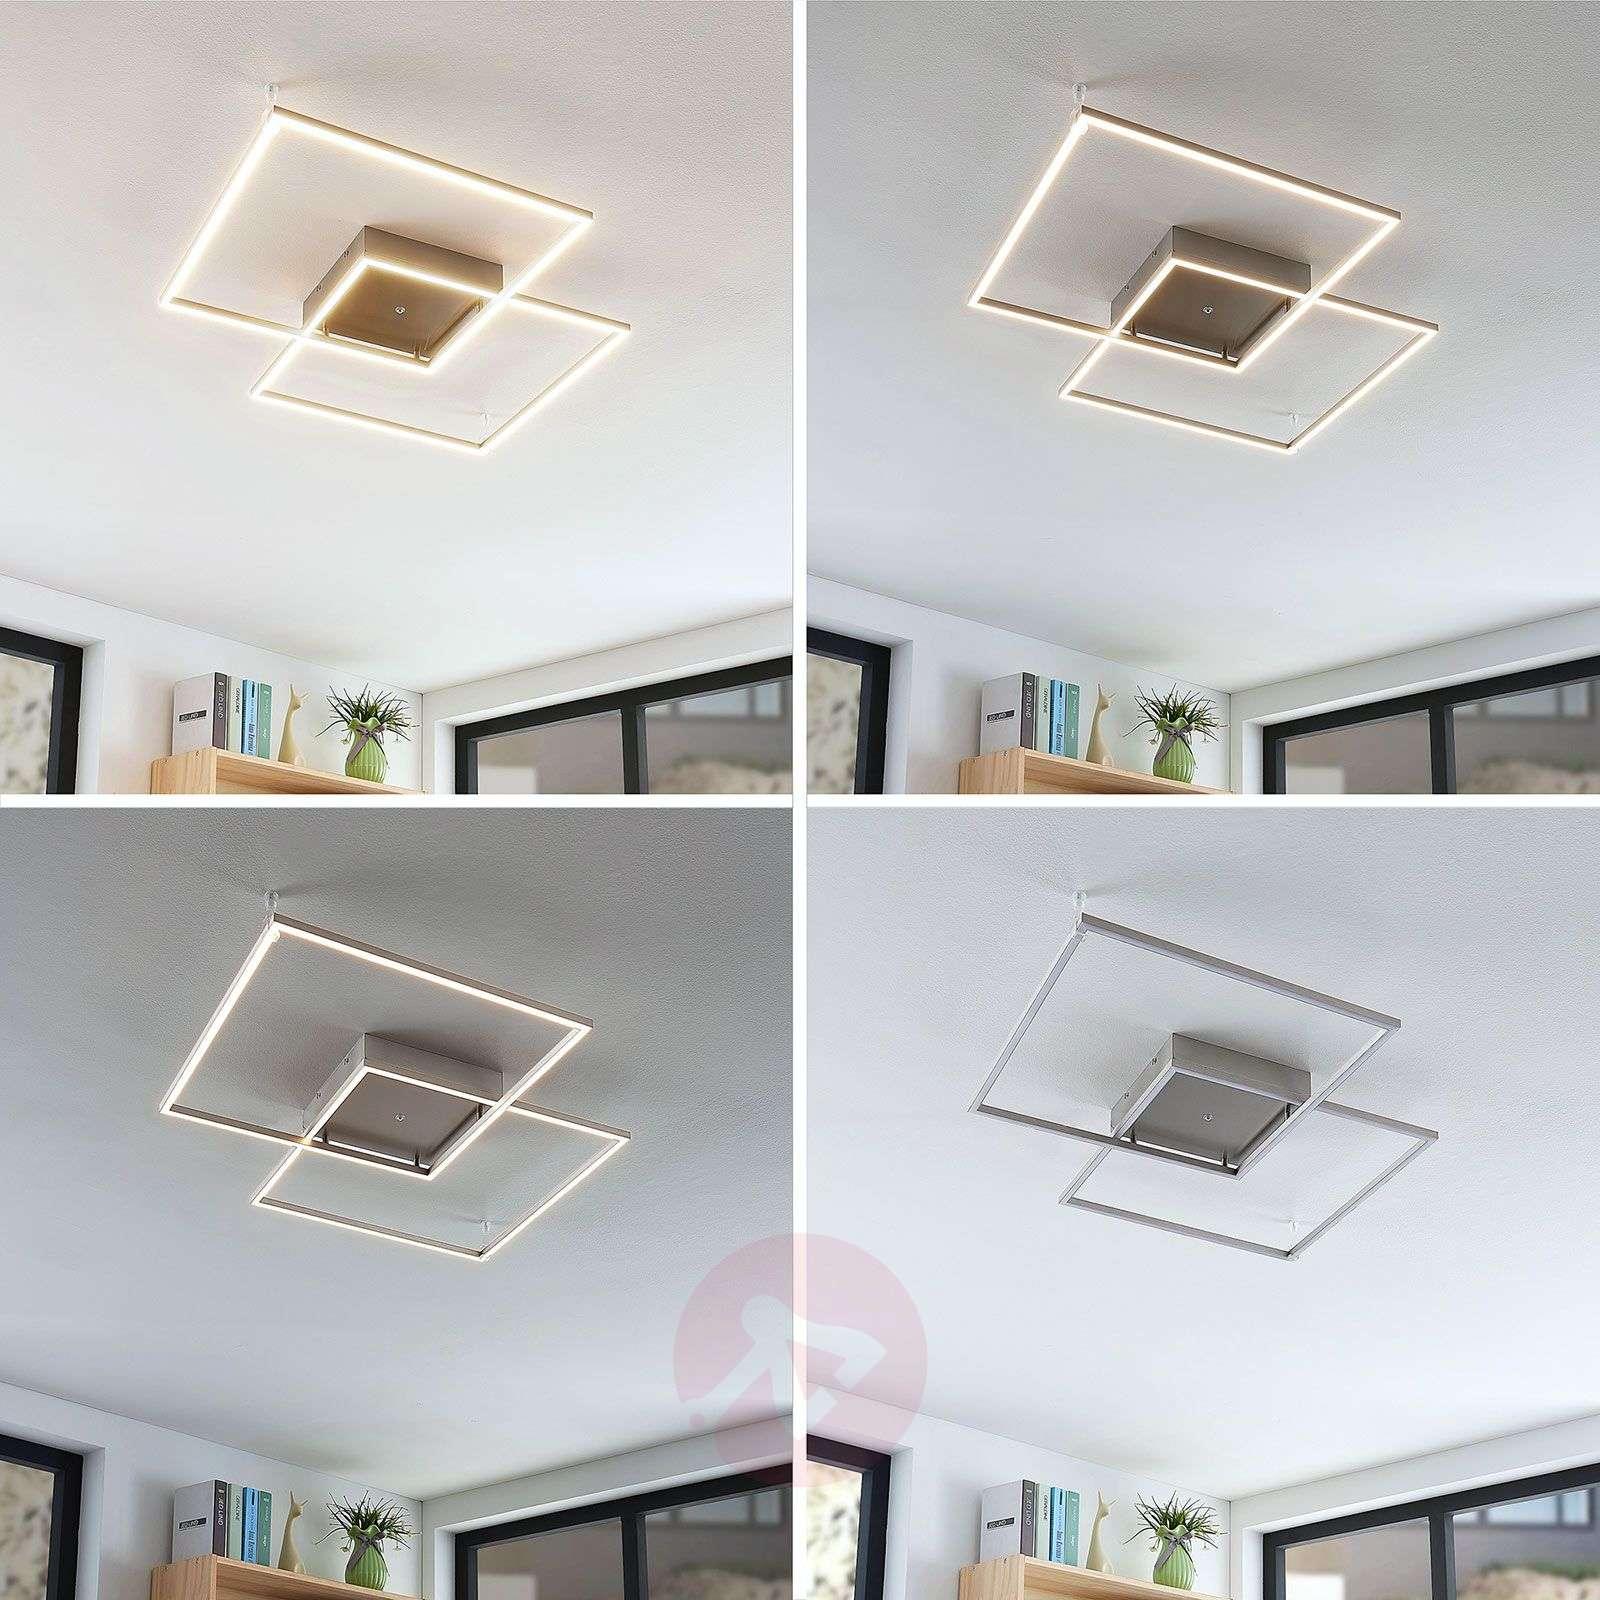 Mirac - LED ceiling light offering bright lighting | Lights.ie